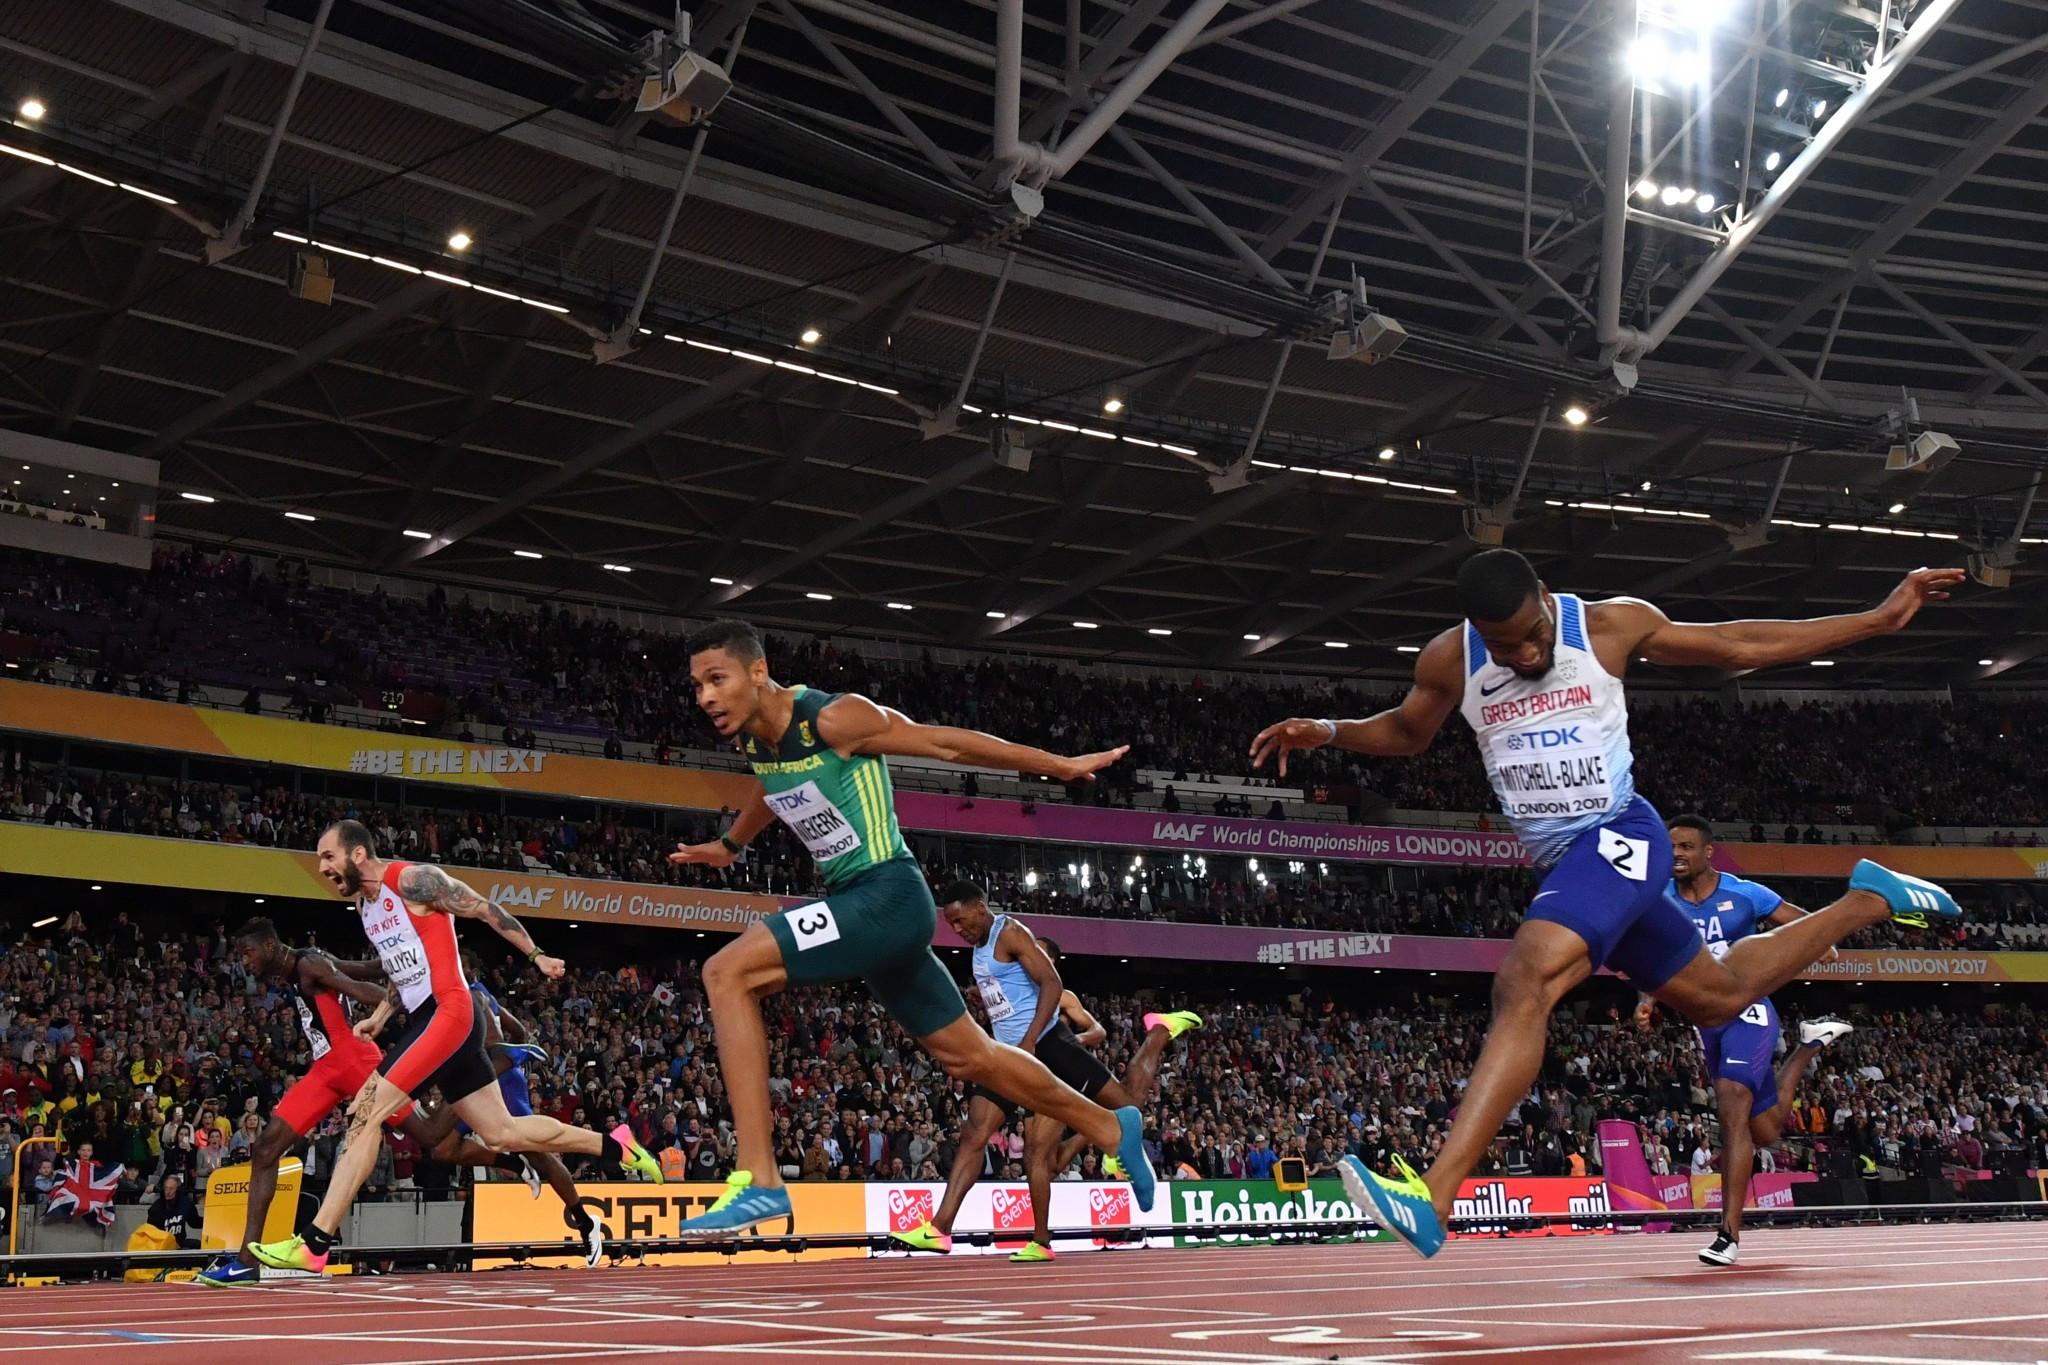 Wayde van Niekerk has been tasked with following in the footsteps of Usain Bolt ©Getty Images